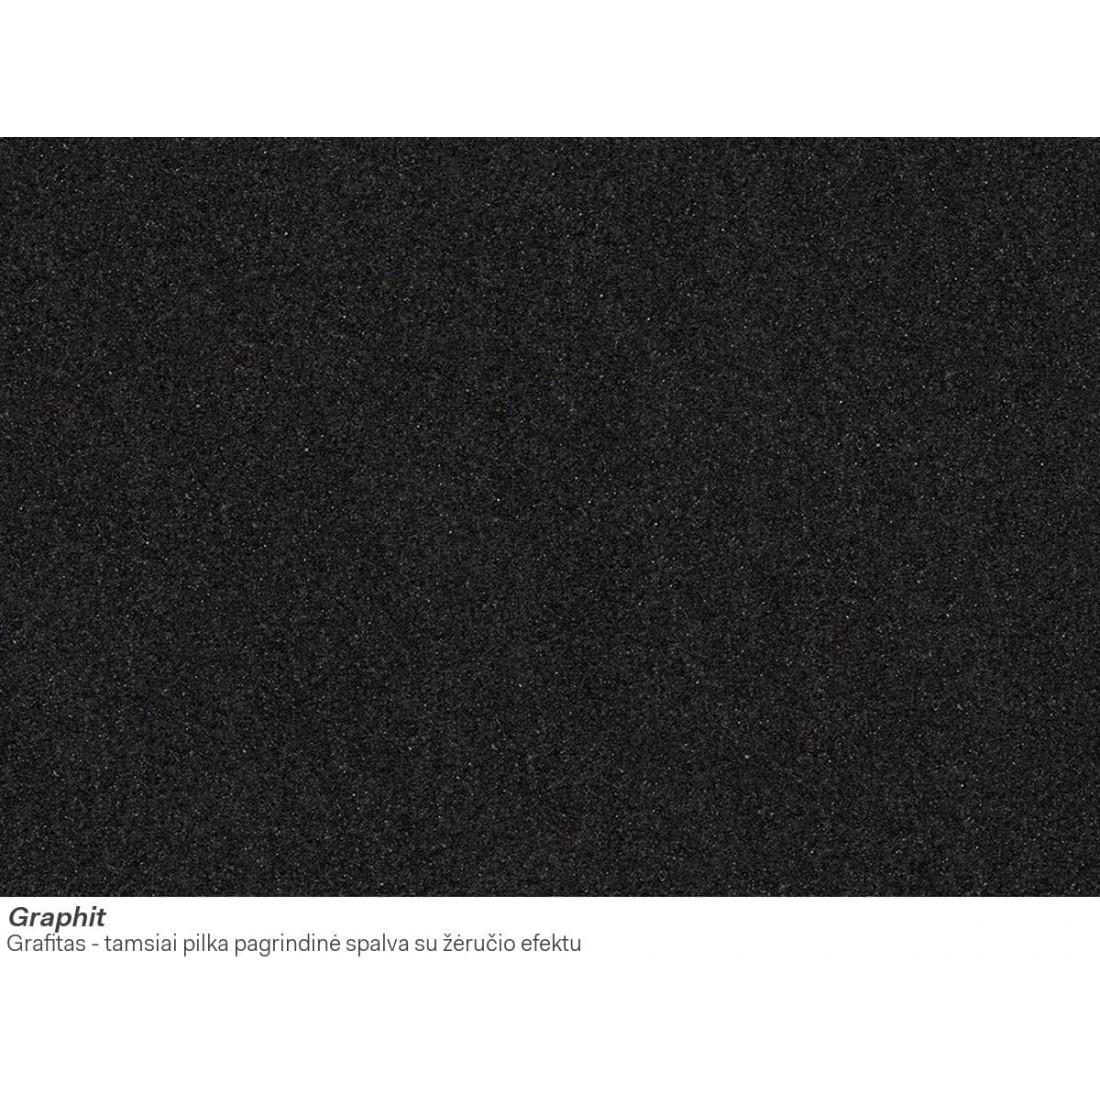 Akmens masės plautuvė Franke FX FXG 661, Graphit